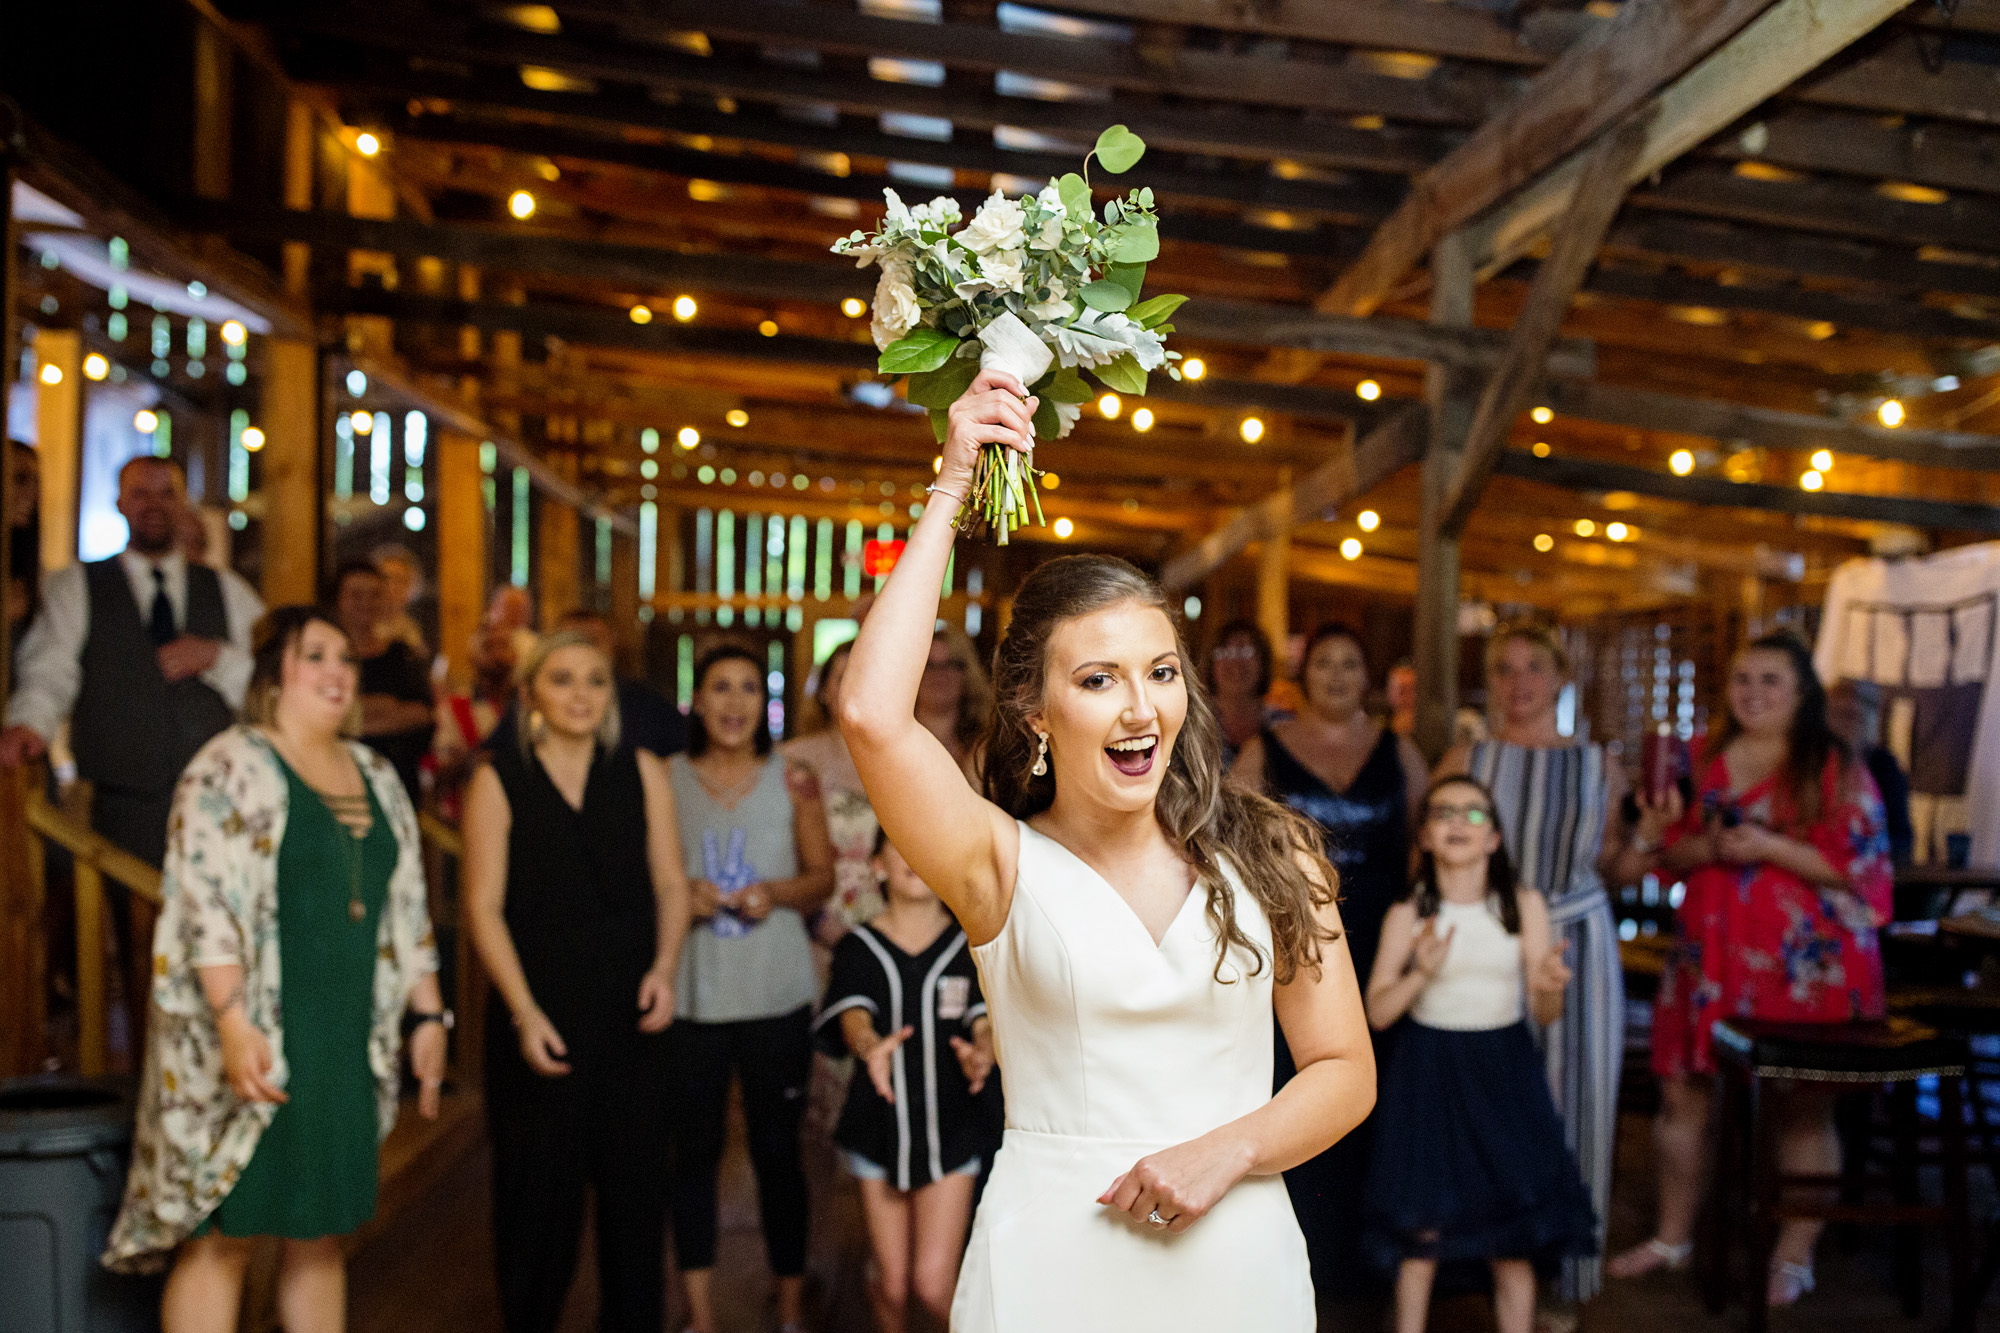 Seriously_Sabrina_Photography_Red_River_Gorge_Wedding_Barn_Robinson107.jpg